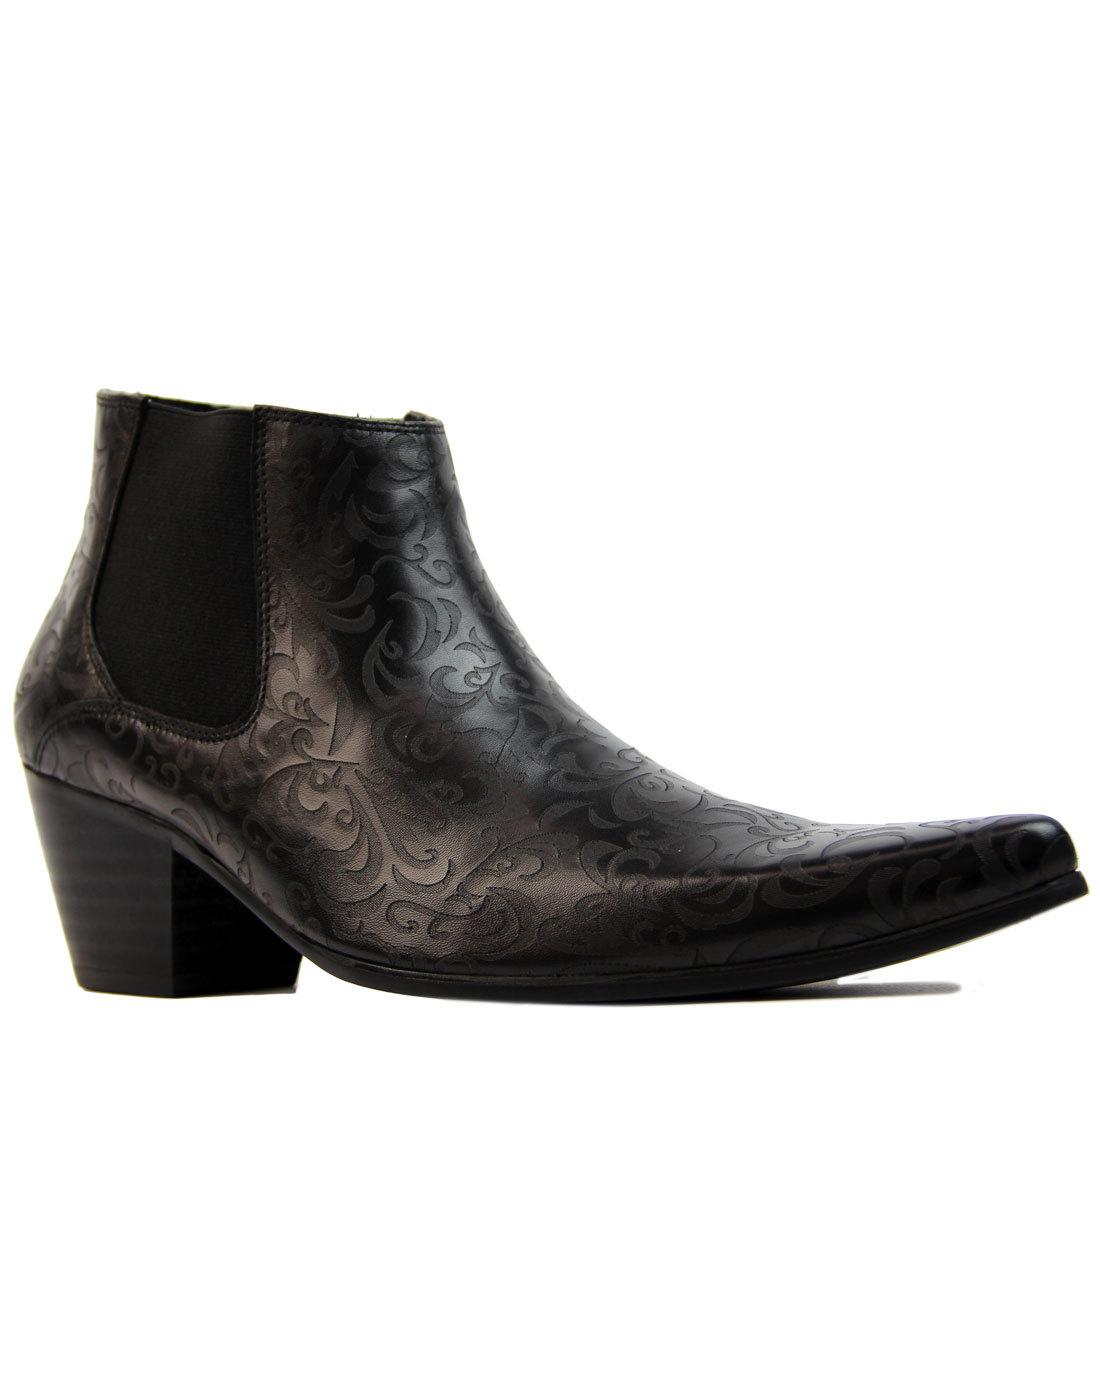 madcap england vinnie paisley cuban chelsea boots